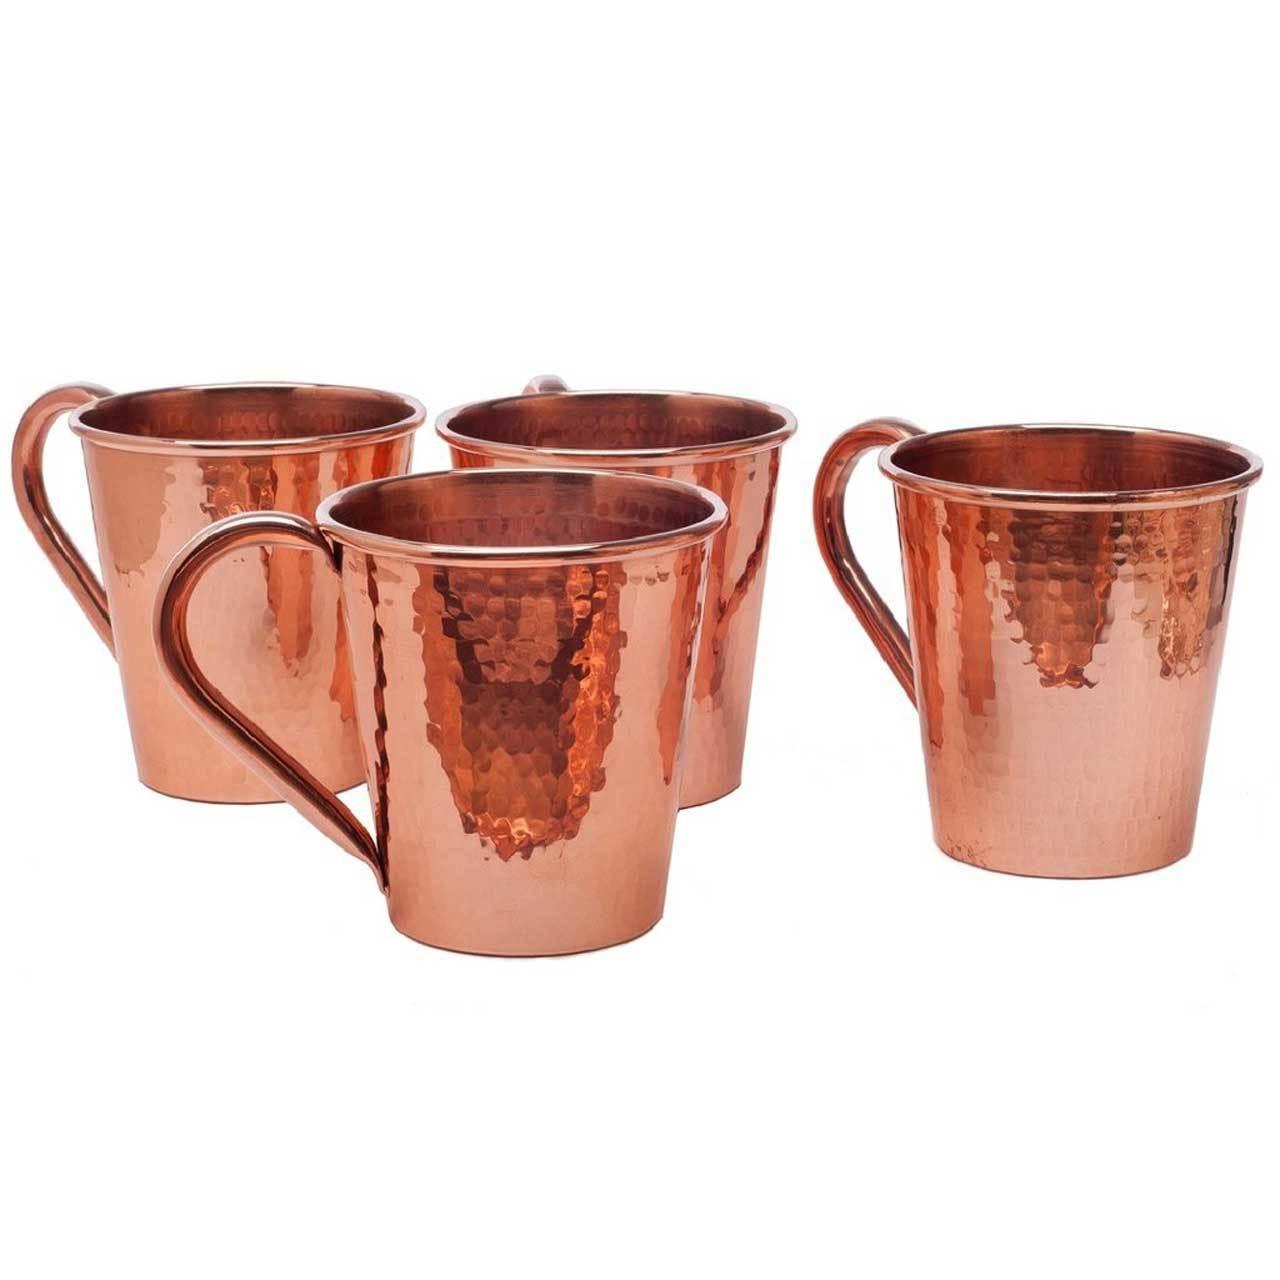 Sertodo Copper Moscow Mule Mug 12oz copper handle